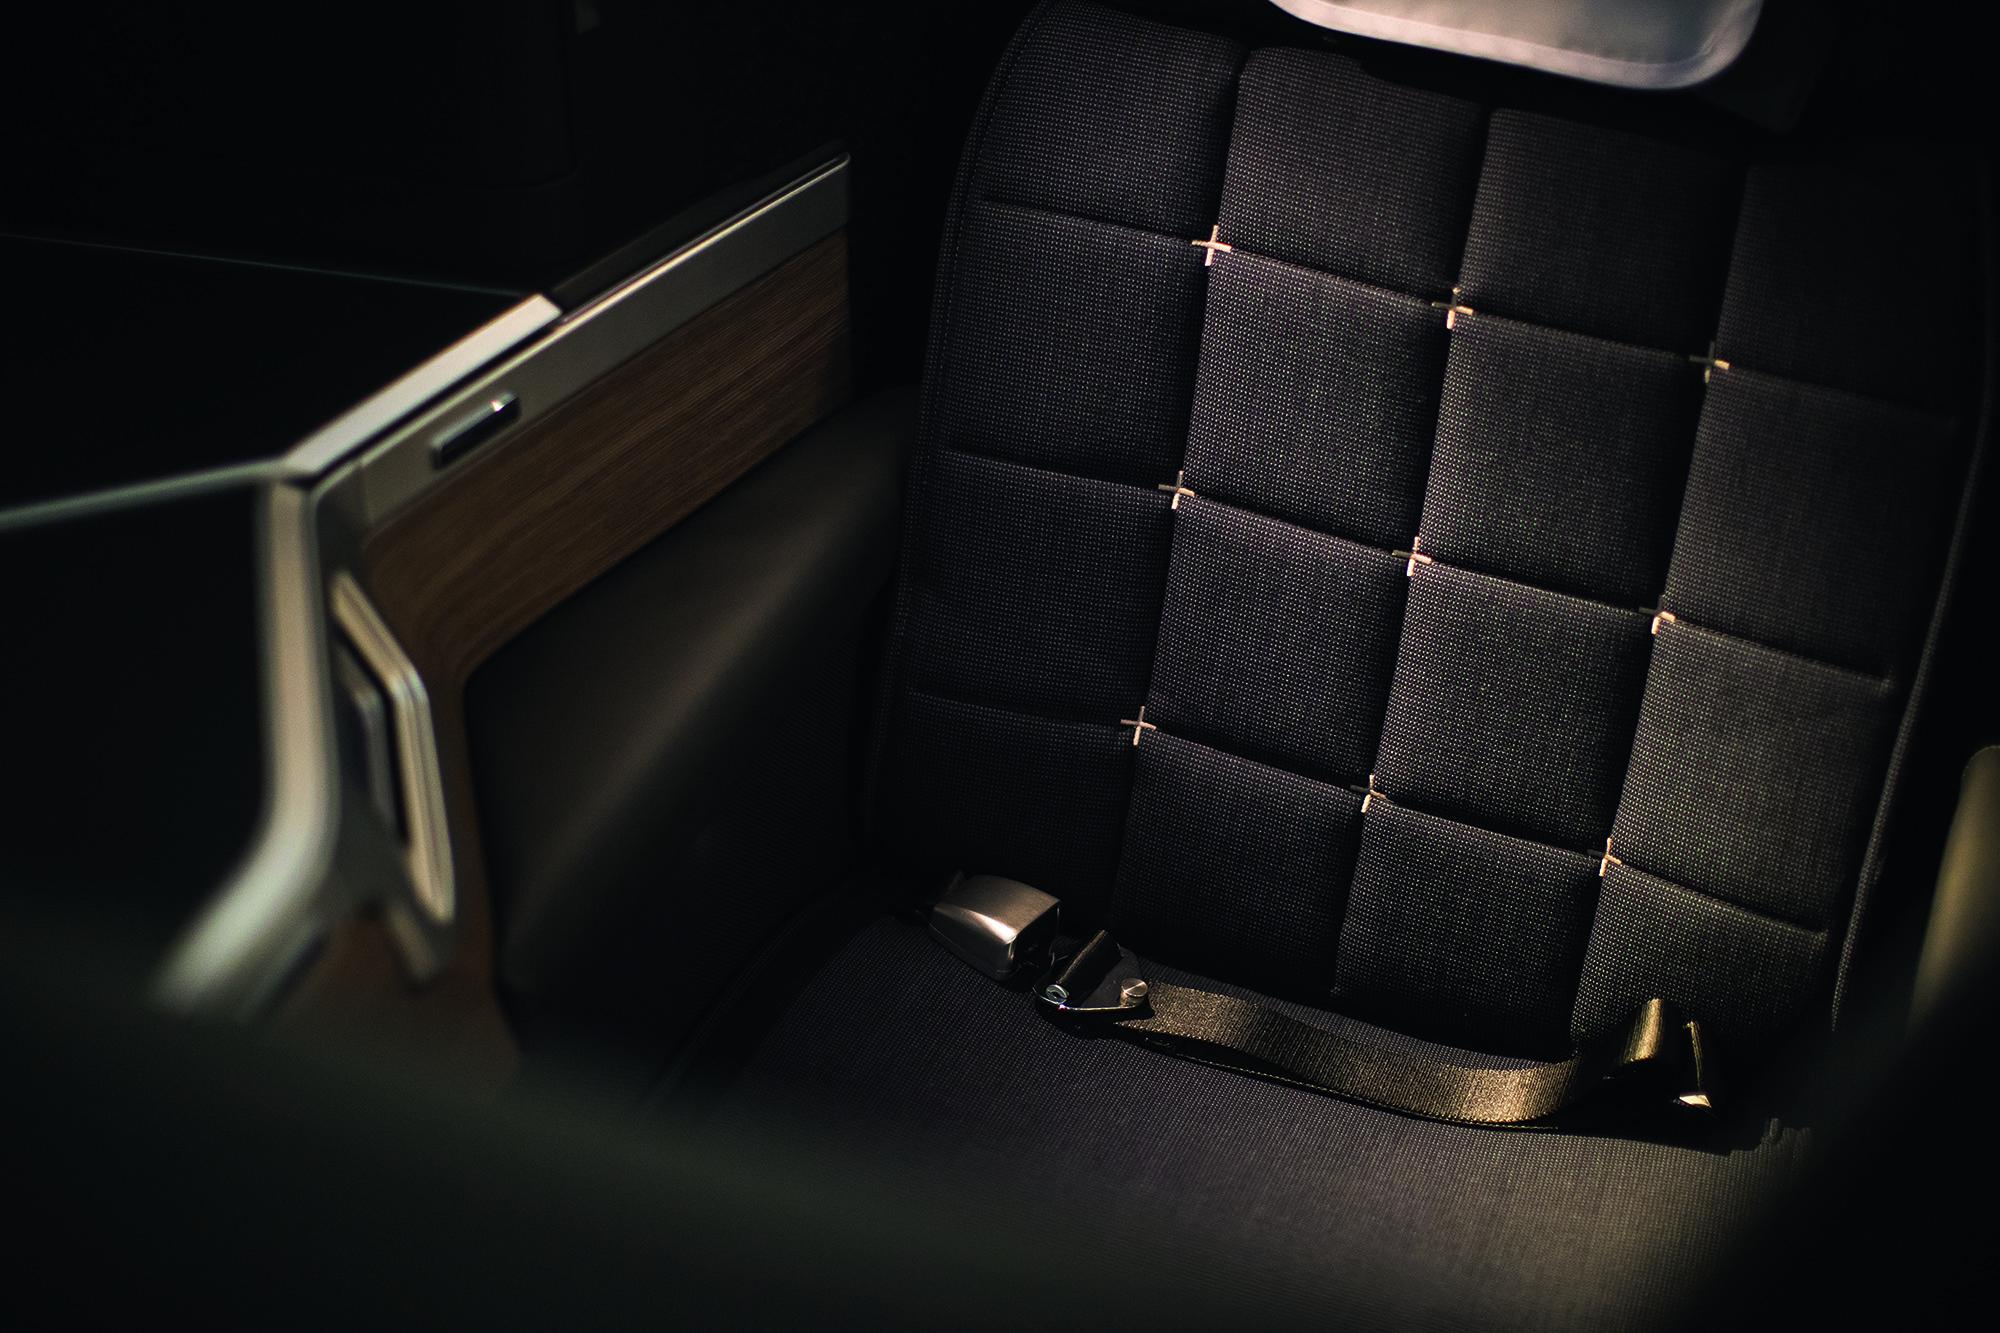 BA Club Suite Seat Belt (British Airways)